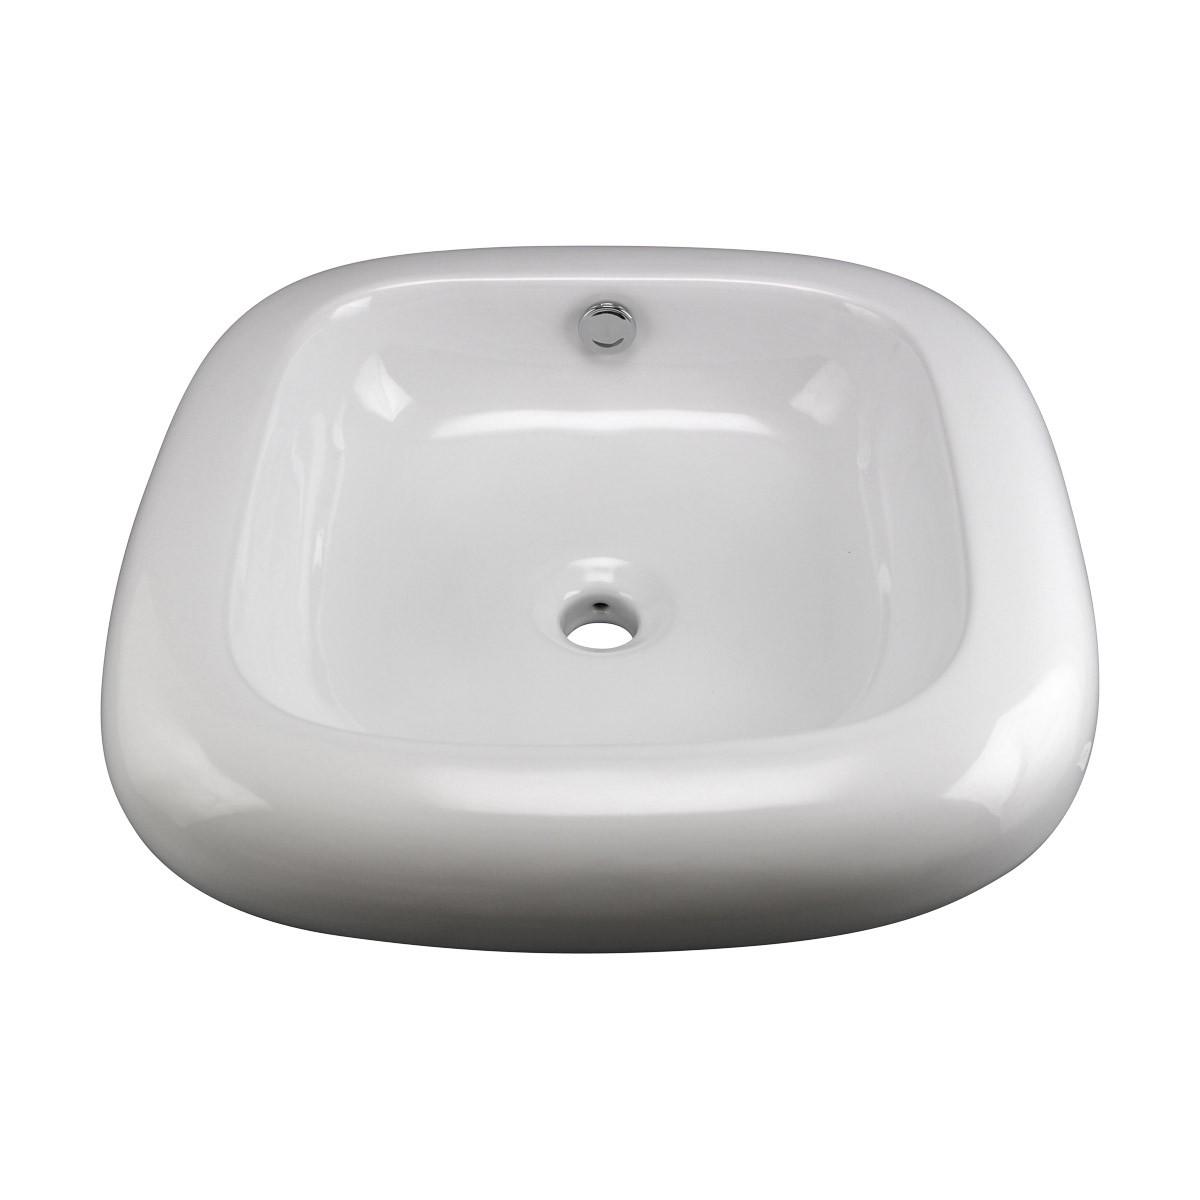 Capri Round White Vessel Sink Grade A Vitreous China bathroom vessel sinks Countertop vessel sink Bathroom Vessel Sink